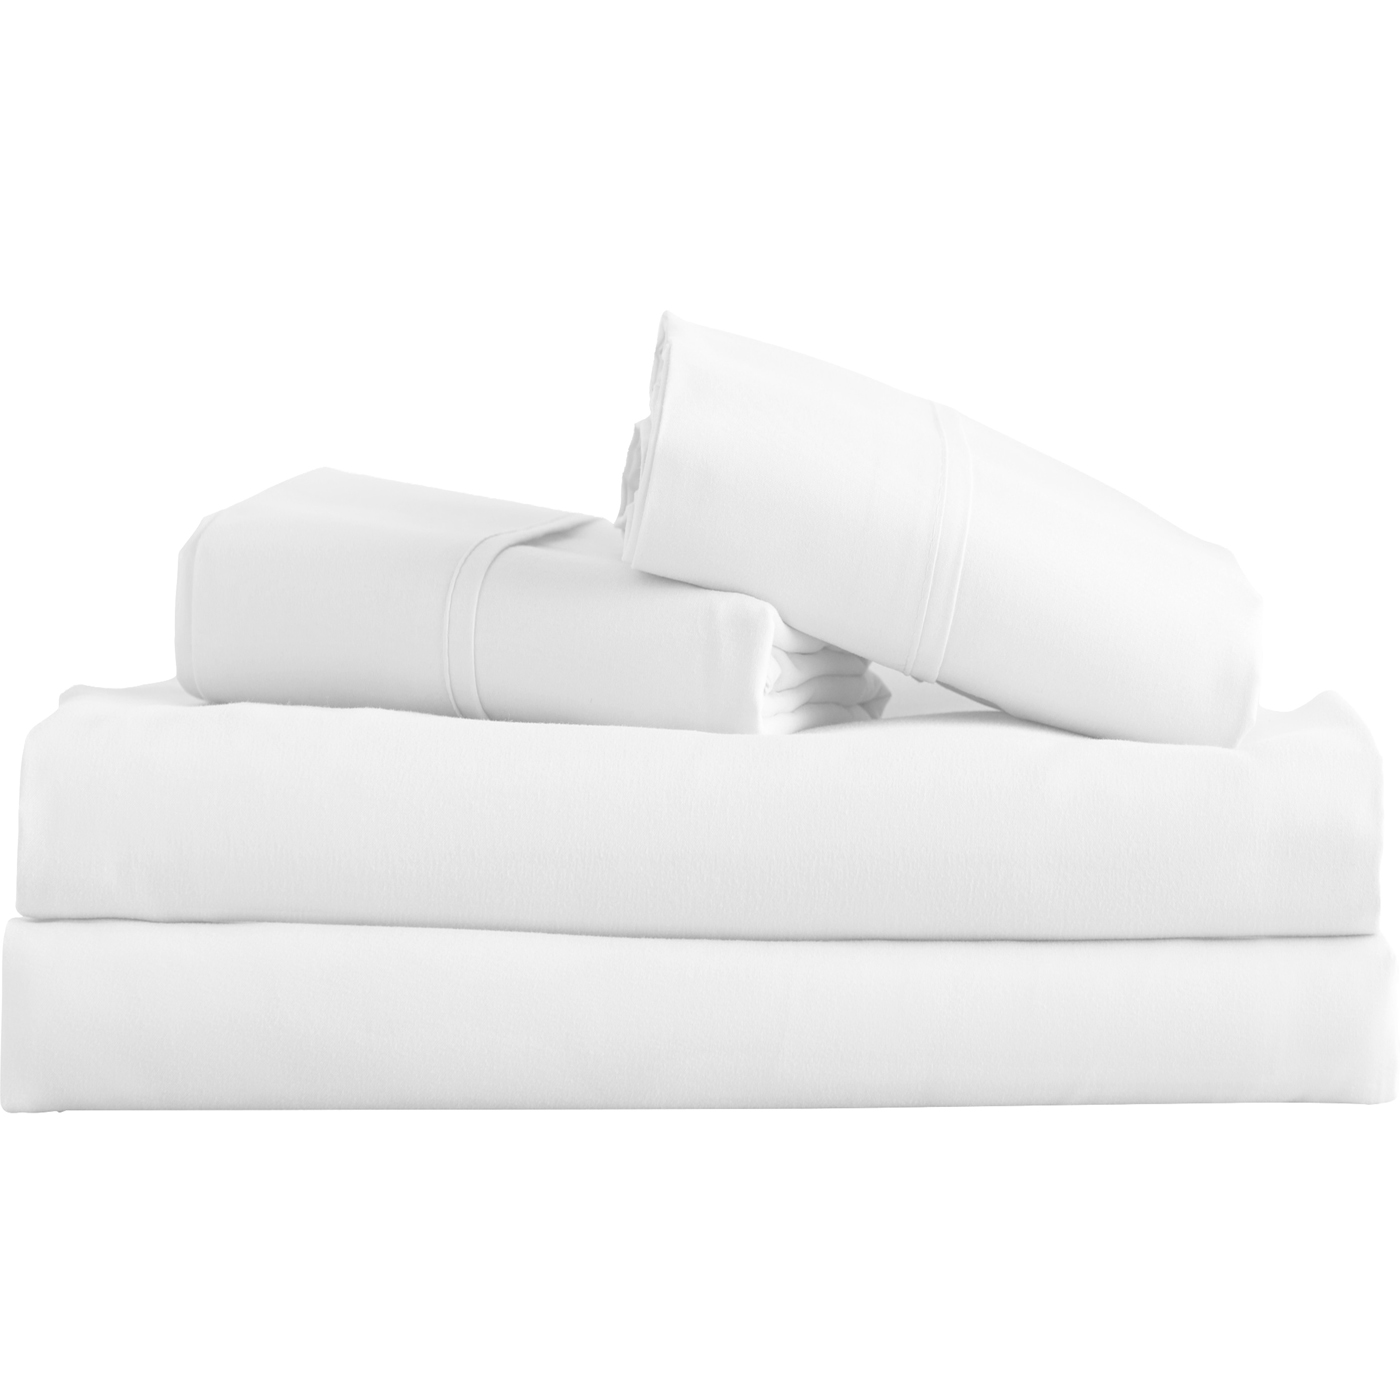 Supreme-Super-Soft-4-Piece-Bed-Sheet-Set-Deep-Pocket-Bedding-All-Colors-Sizes thumbnail 102